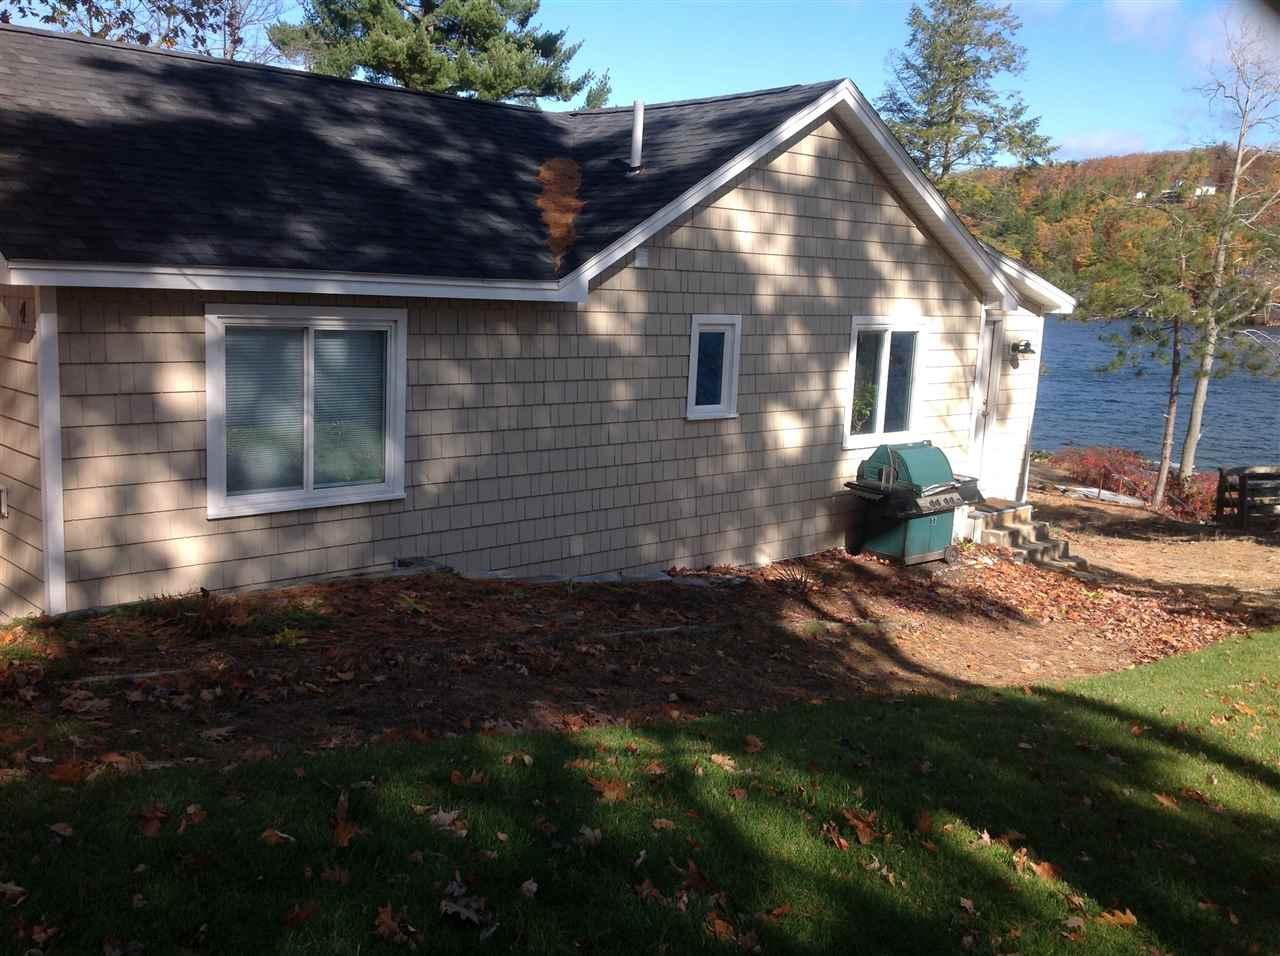 Alton NH Lake Winnipesaukee waterfront home for sale